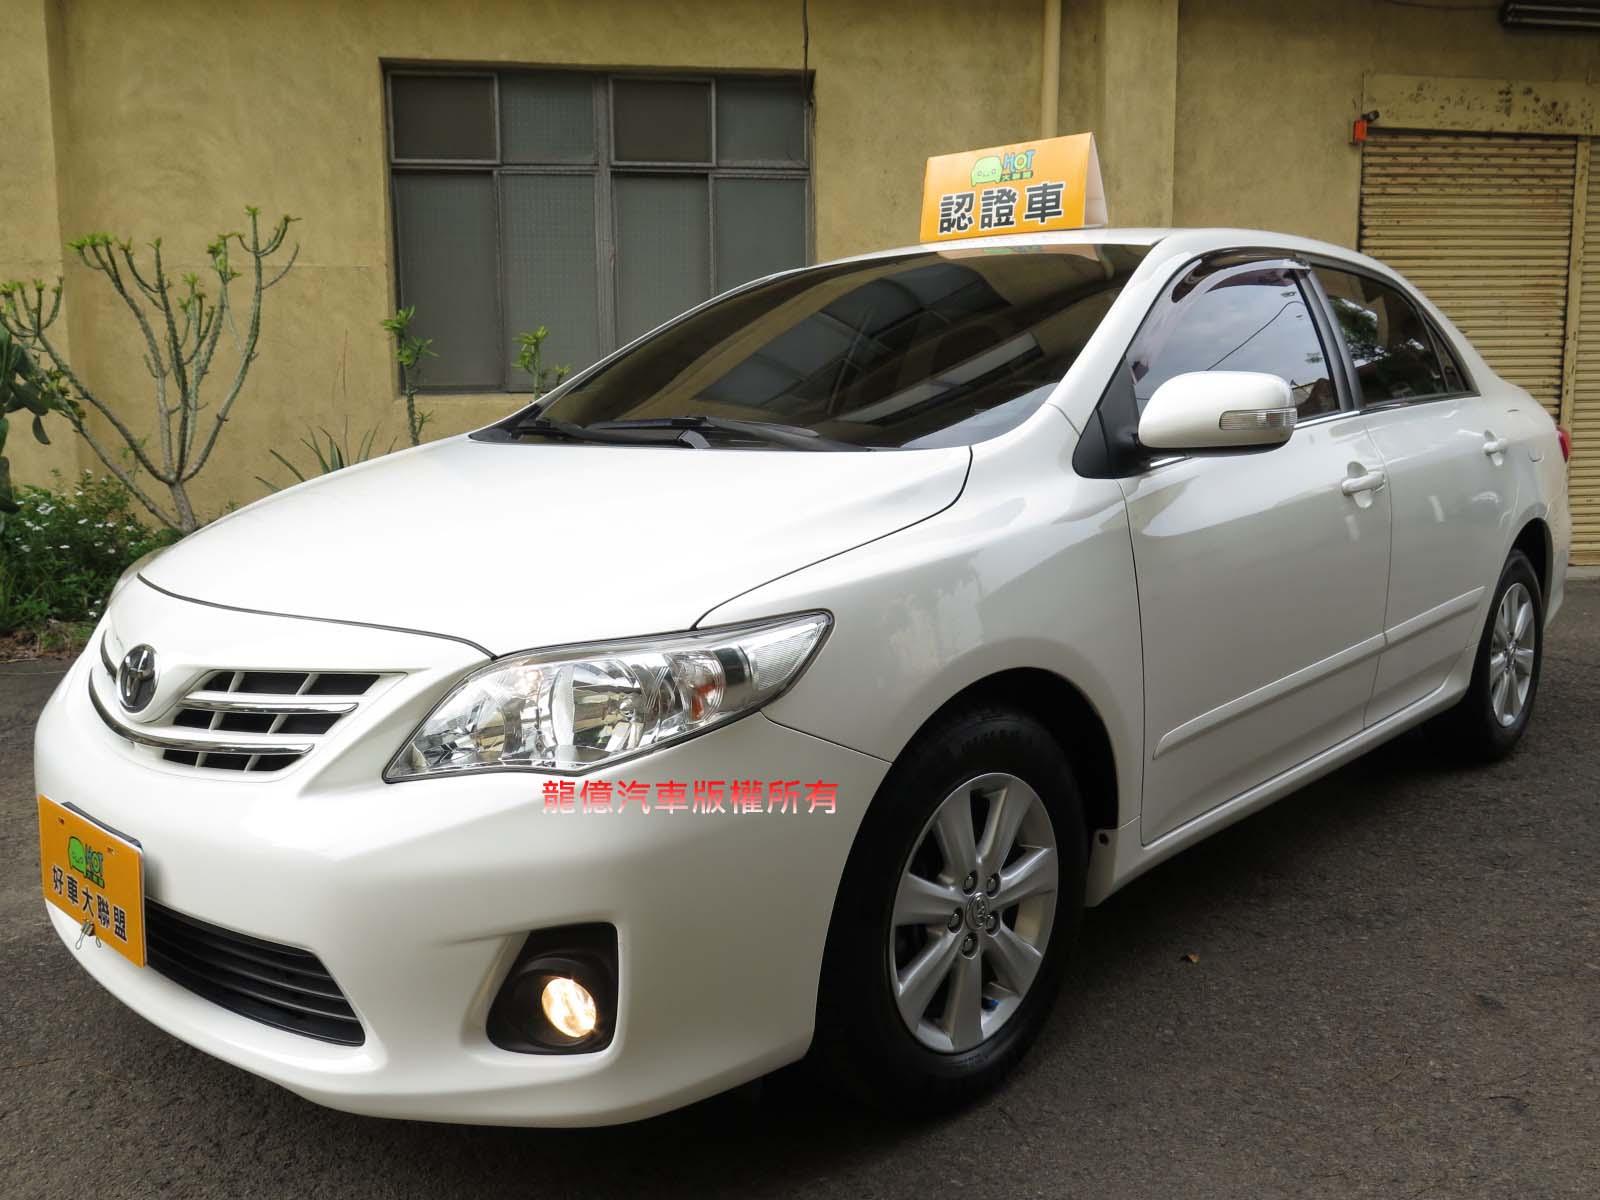 Toyota(豐田)  Altis 13年新款七速1.8E雙安定速 首選國民車NO.1僅跑8萬7原廠保養 已通過HOT檢驗-認證車